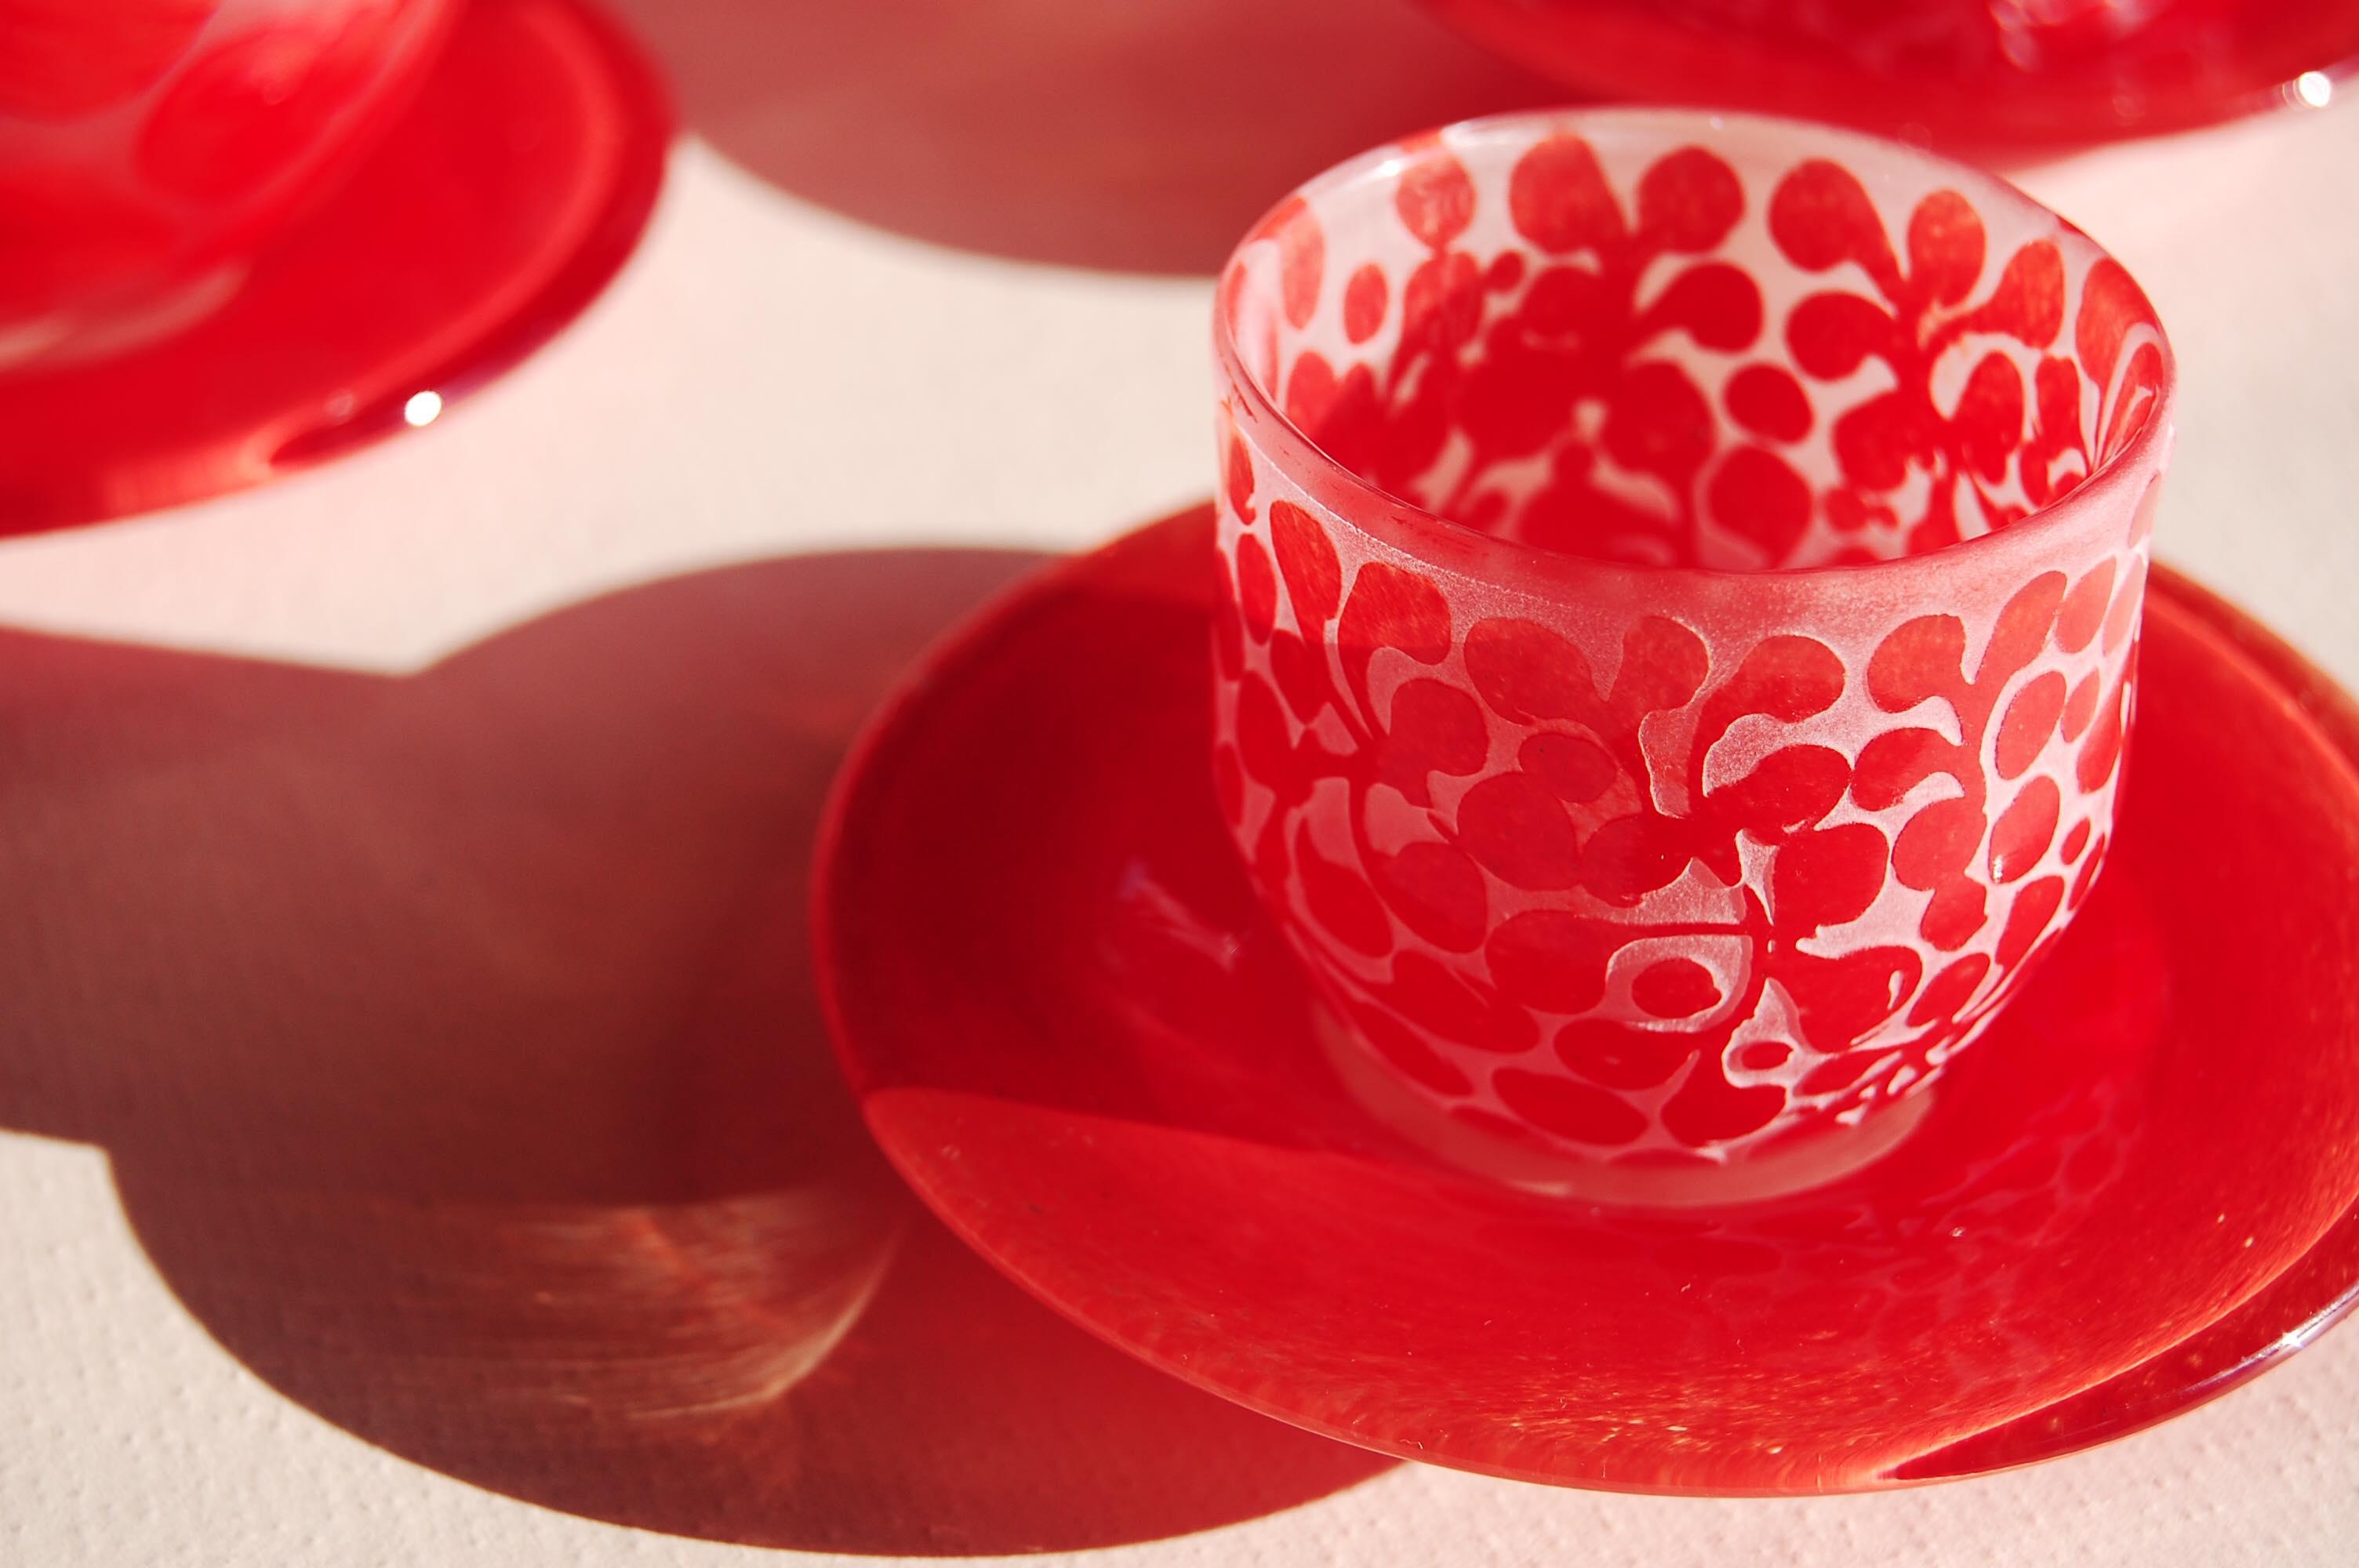 2018年10月1日(月)~10月13日(土)Yukiko Nakano Glass Works 「日々是紅日」